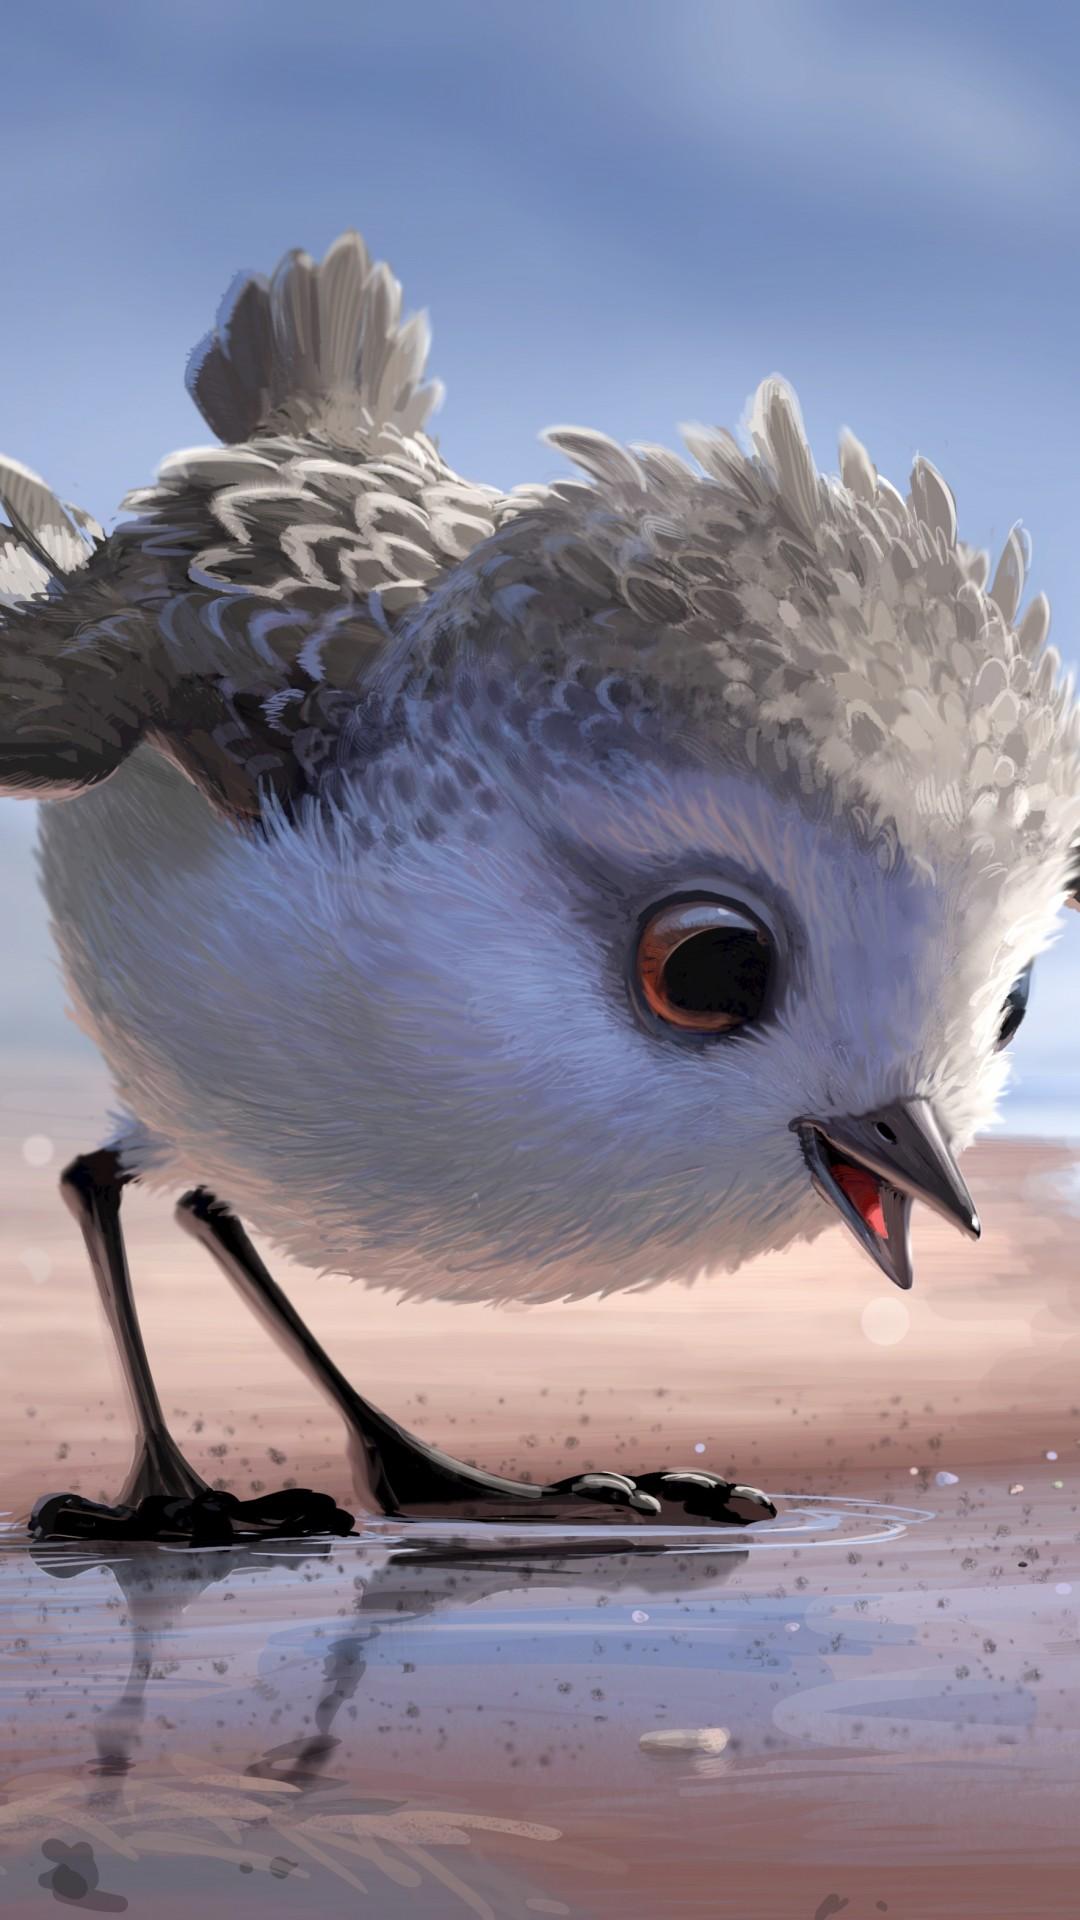 Cute Wallpapers Quotes Walt Disney Wallpaper Piper Bird Pixar Movies 10361